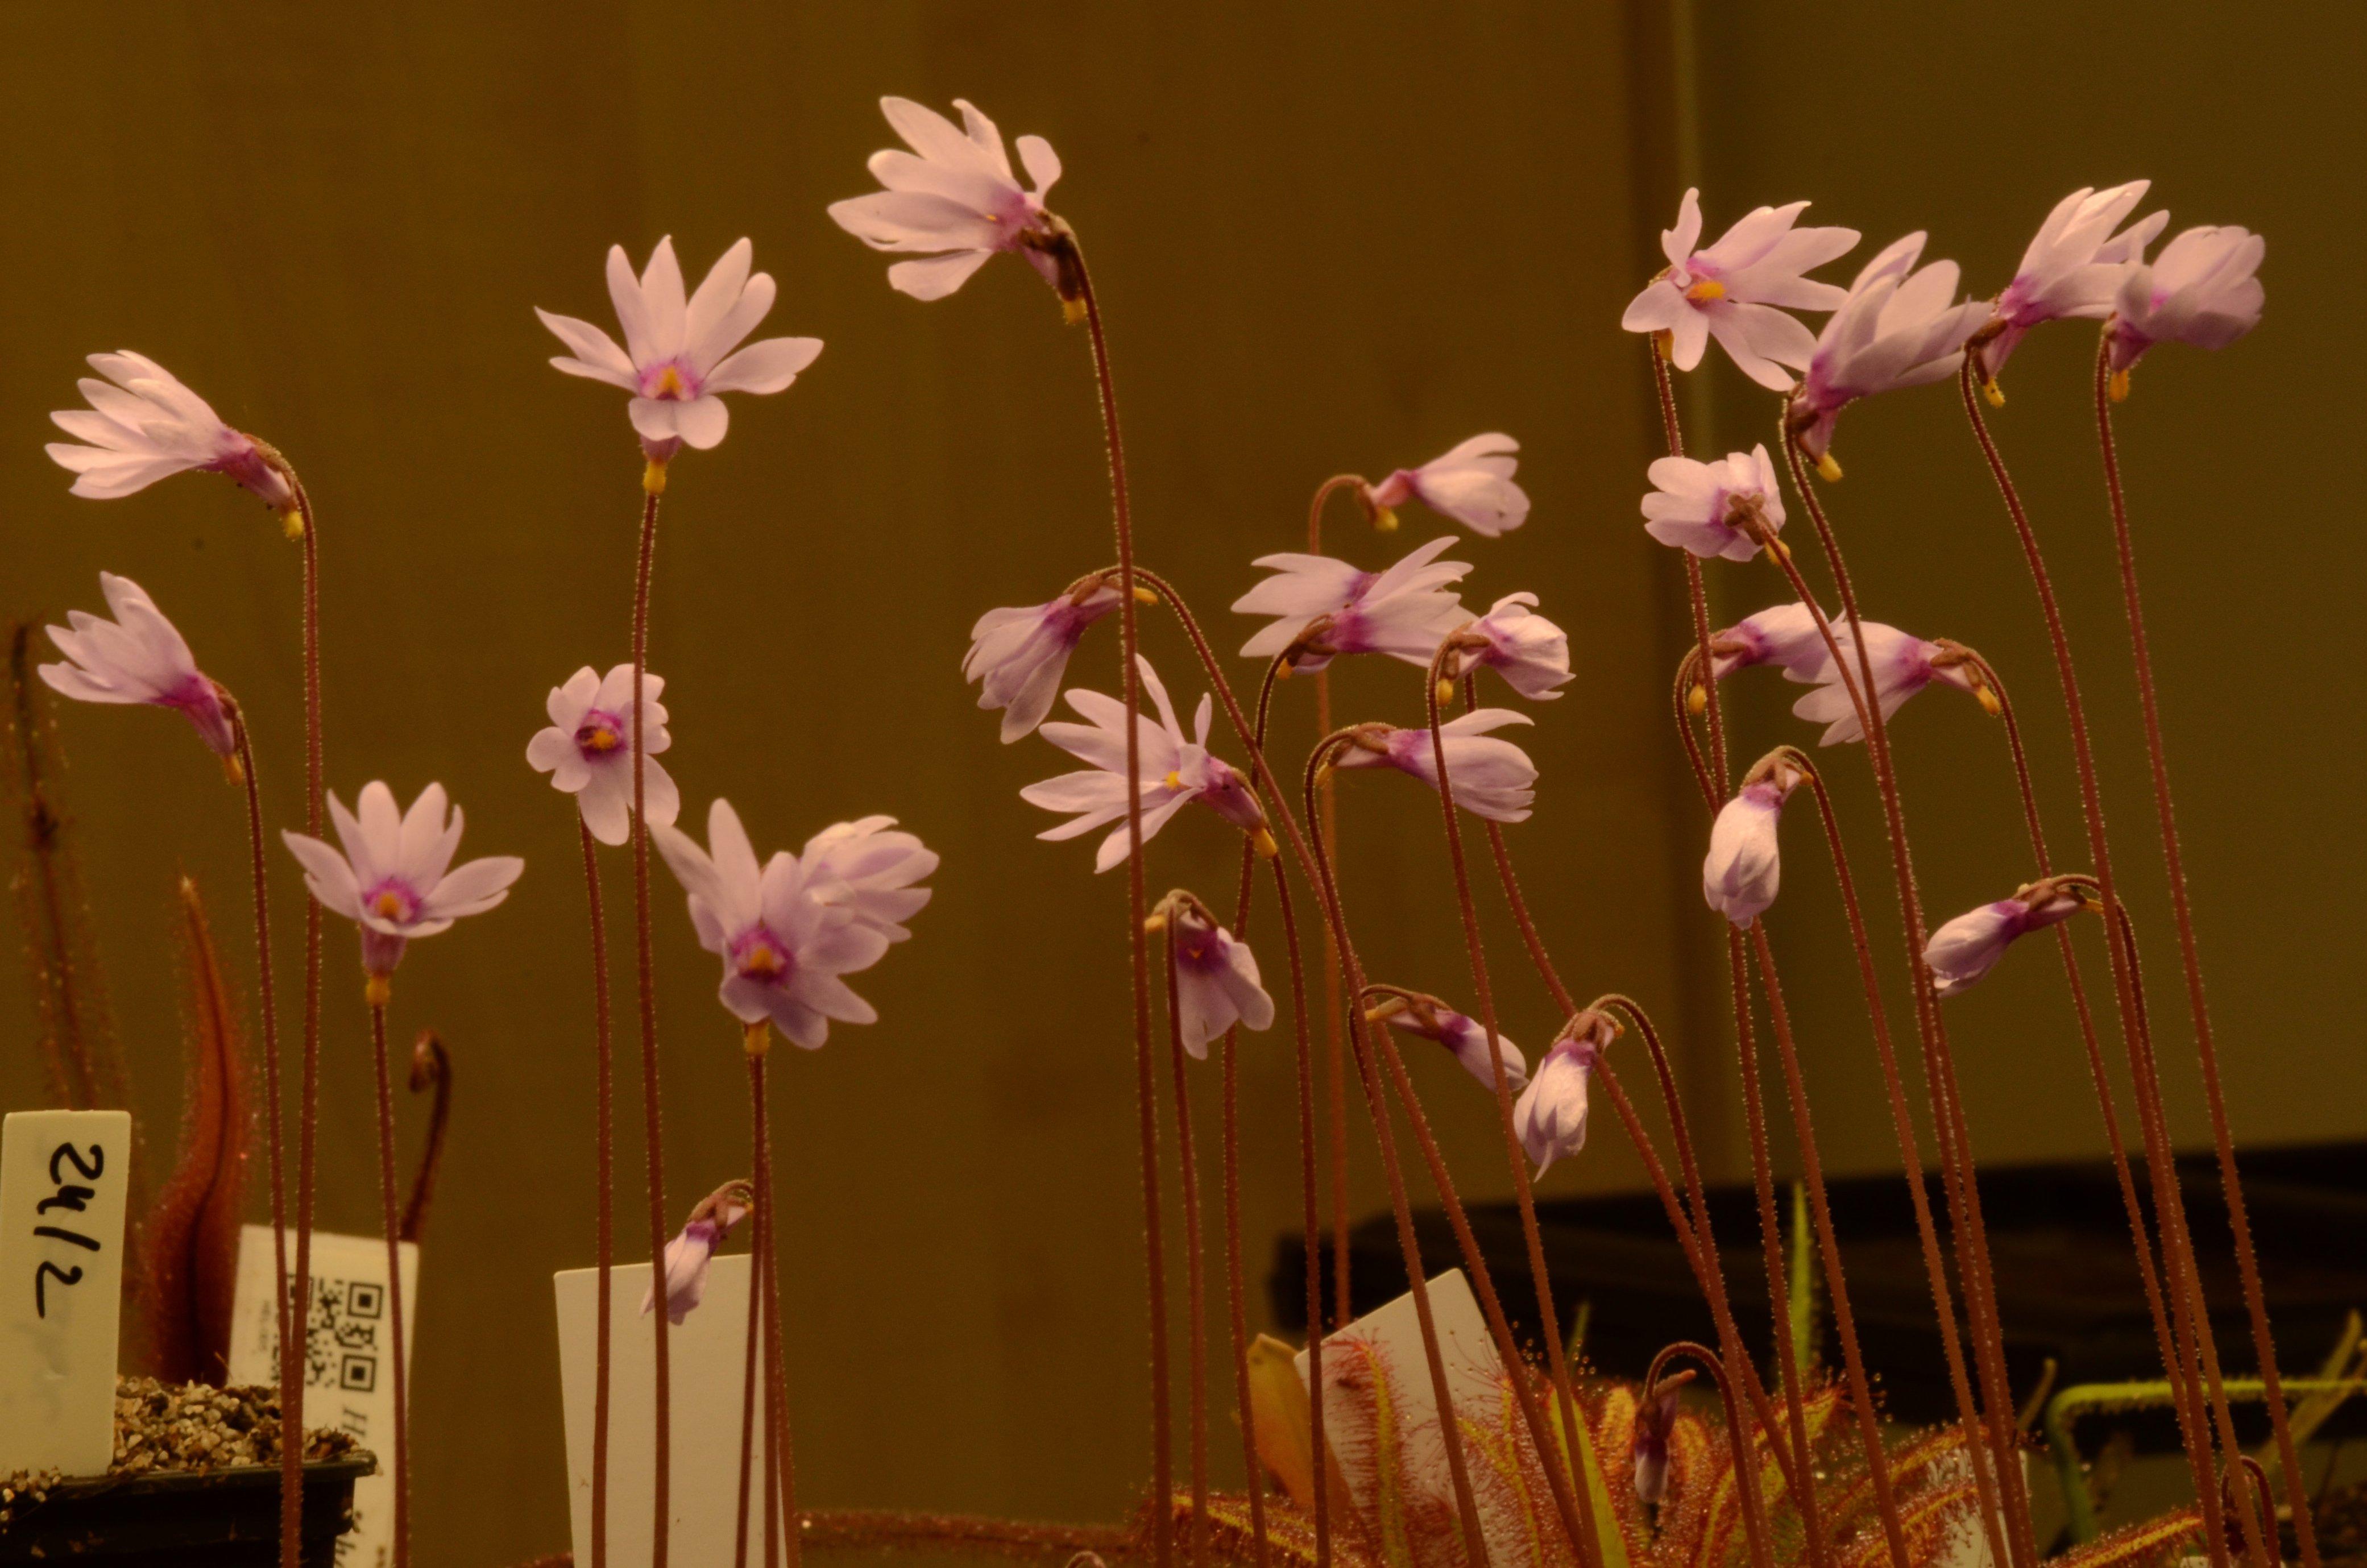 Pinguicula planifolia adultes à vendre DSC_0465.jpg.0024a1e642faf37bcedb7e87ebed893e